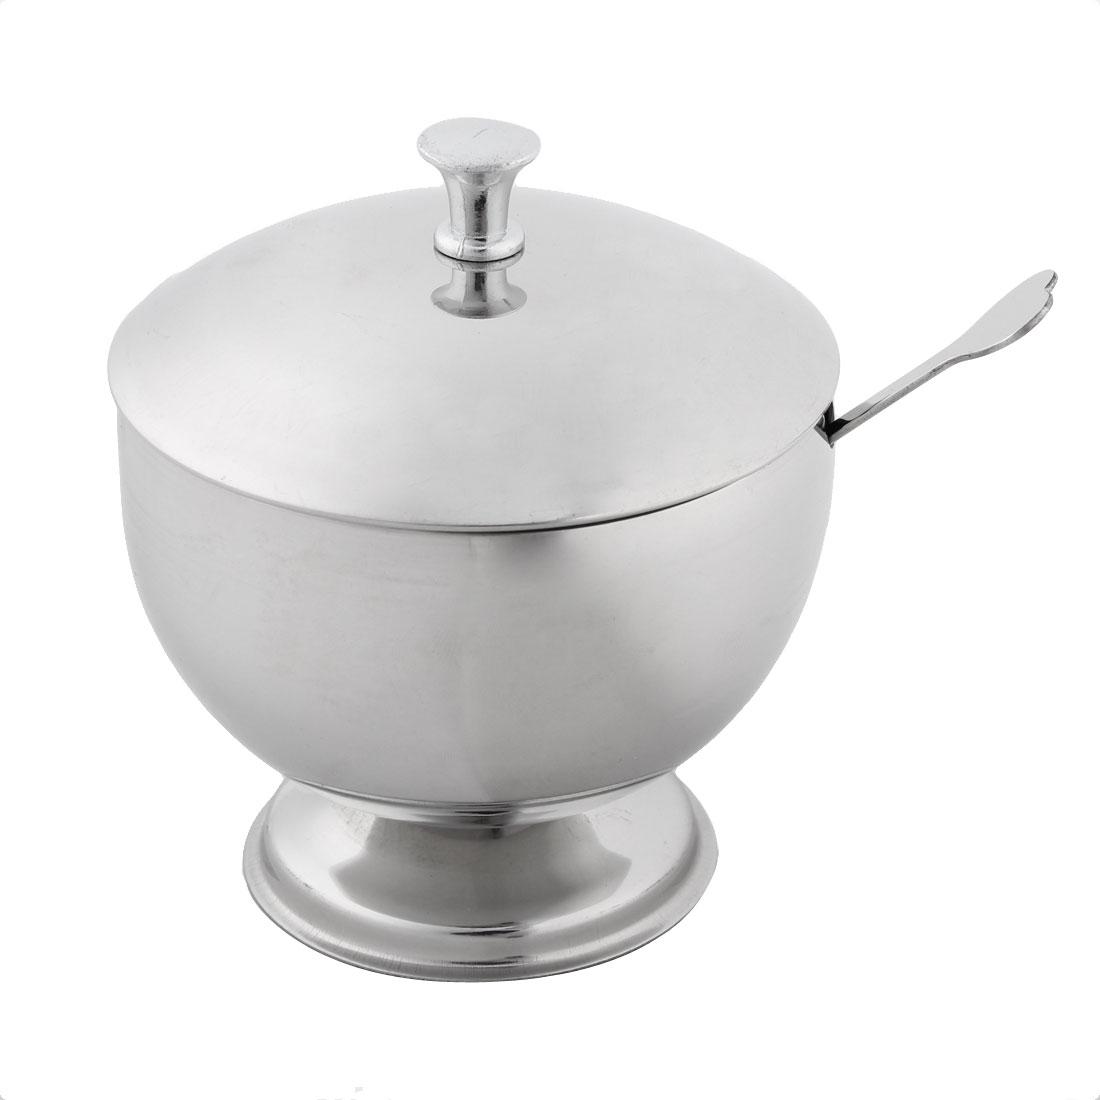 Restaurant Stainess Stell Round Shaped Spice Salt Papper Condiment Cruet Bowl